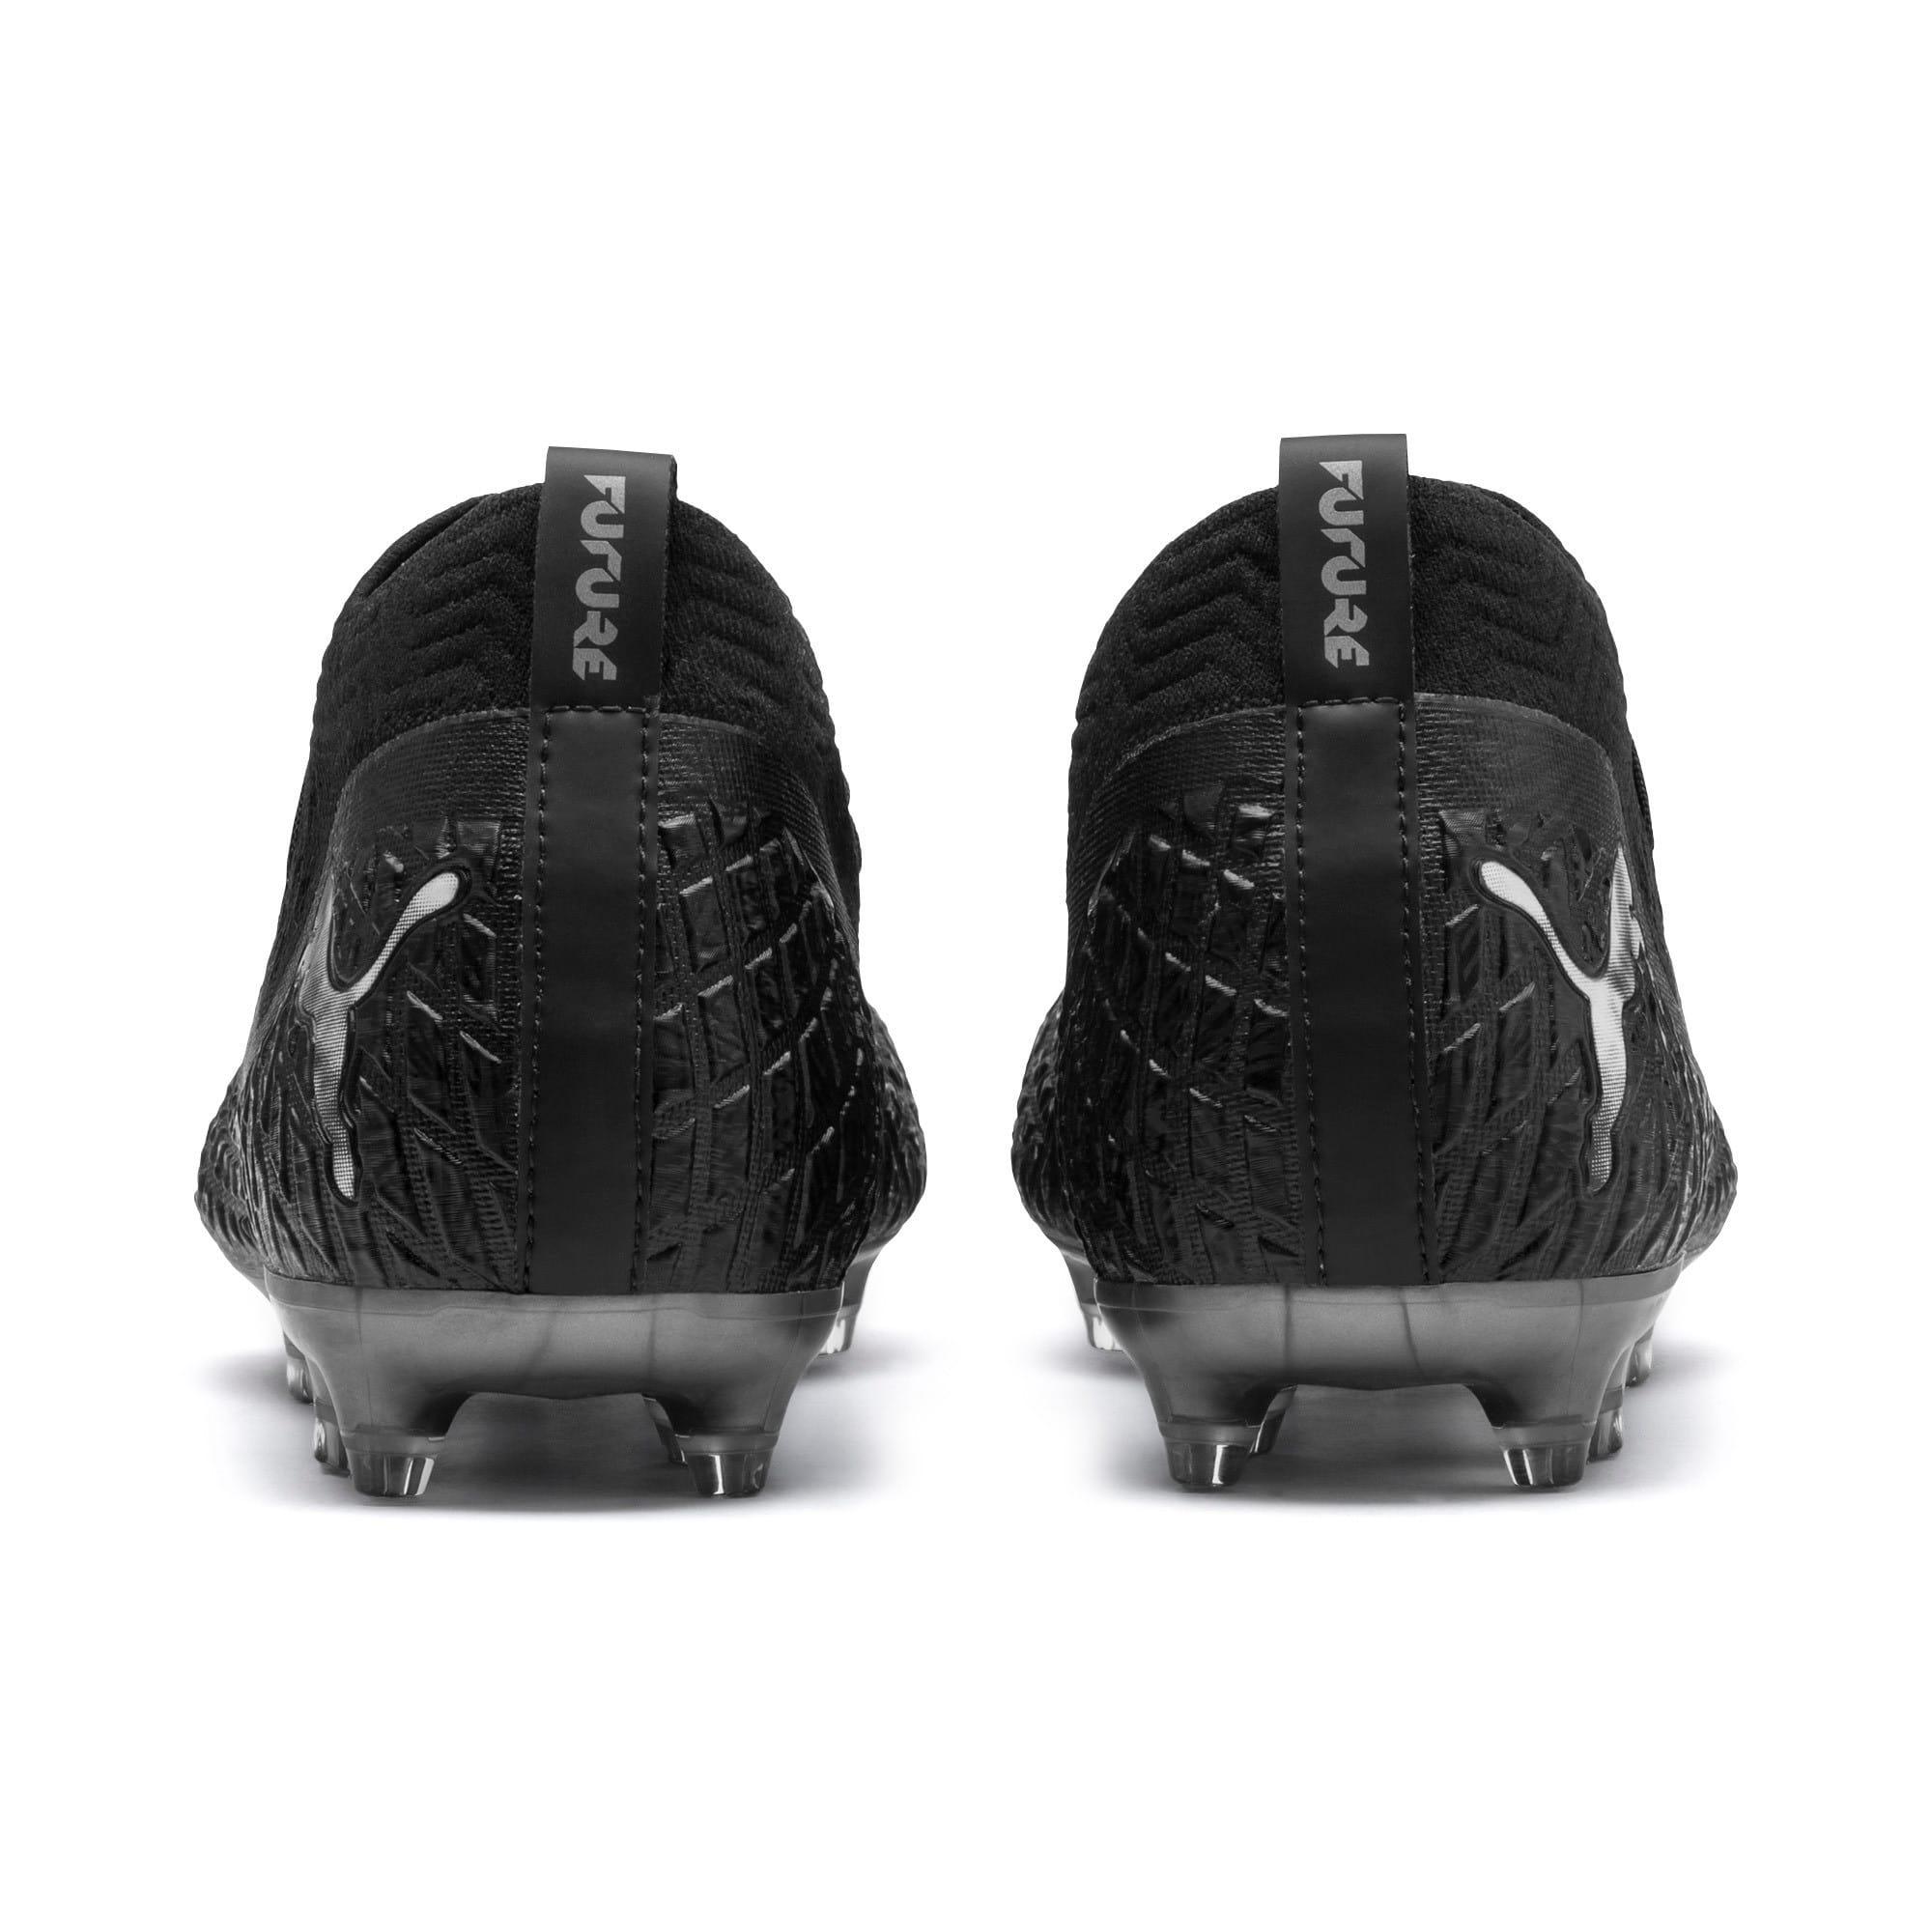 Thumbnail 4 of FUTURE 4.2 NETFIT FG/AG Men's Football Boots, Black-Black-Puma Aged Silver, medium